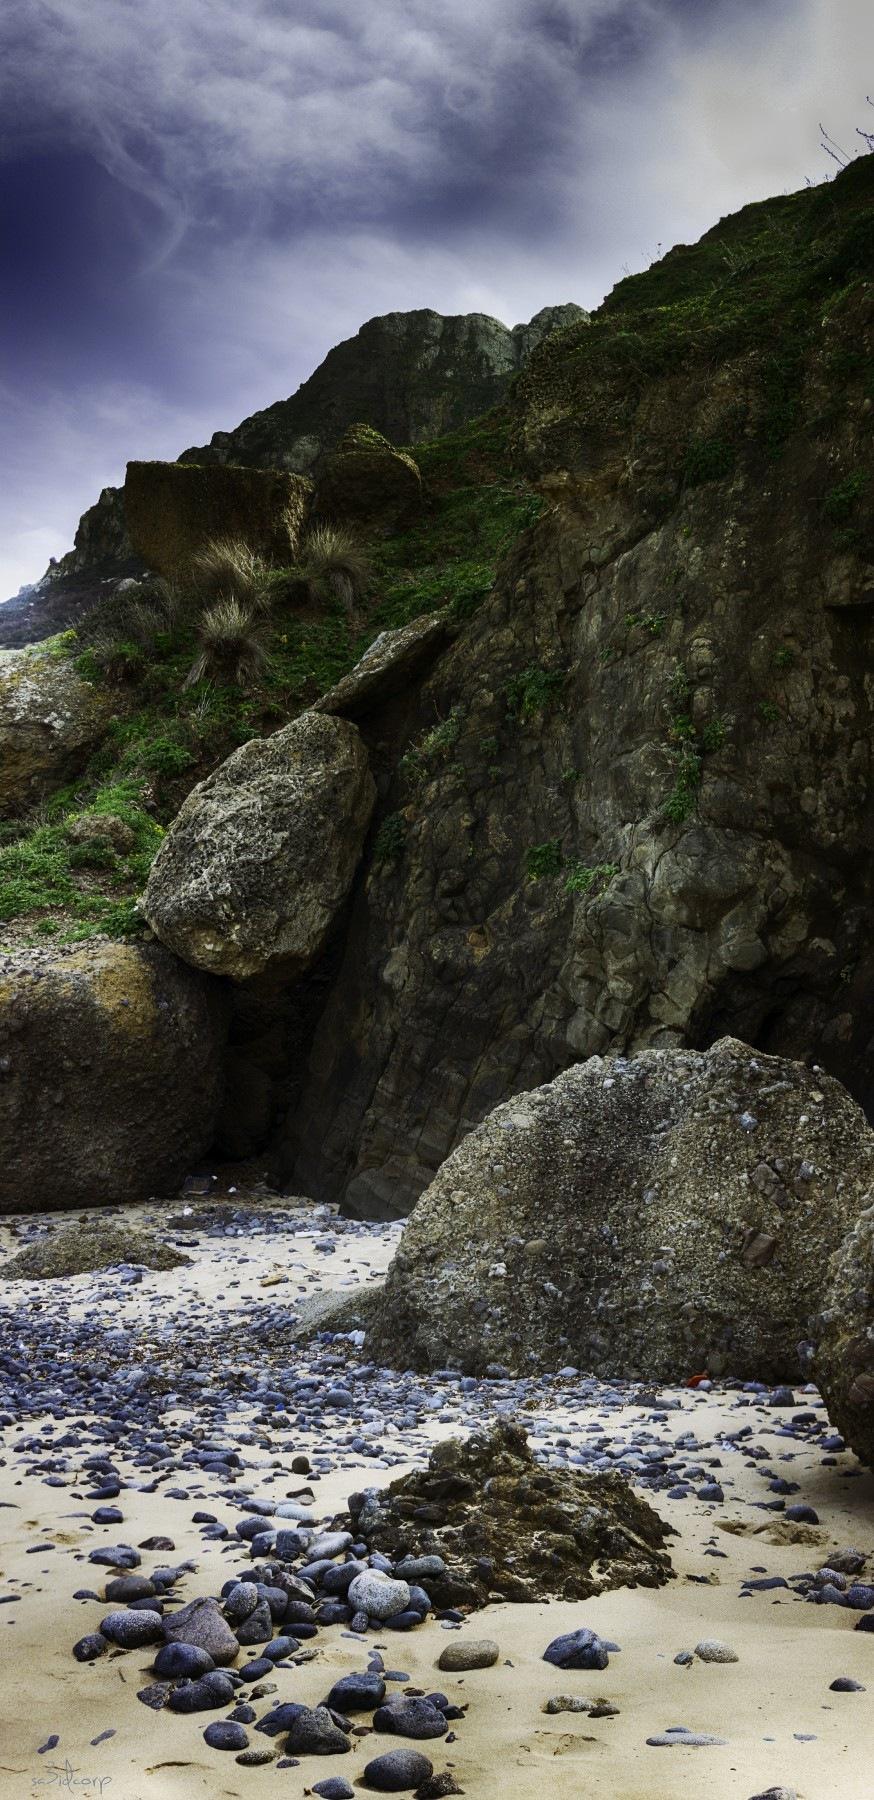 the rocks by sa3idcorp